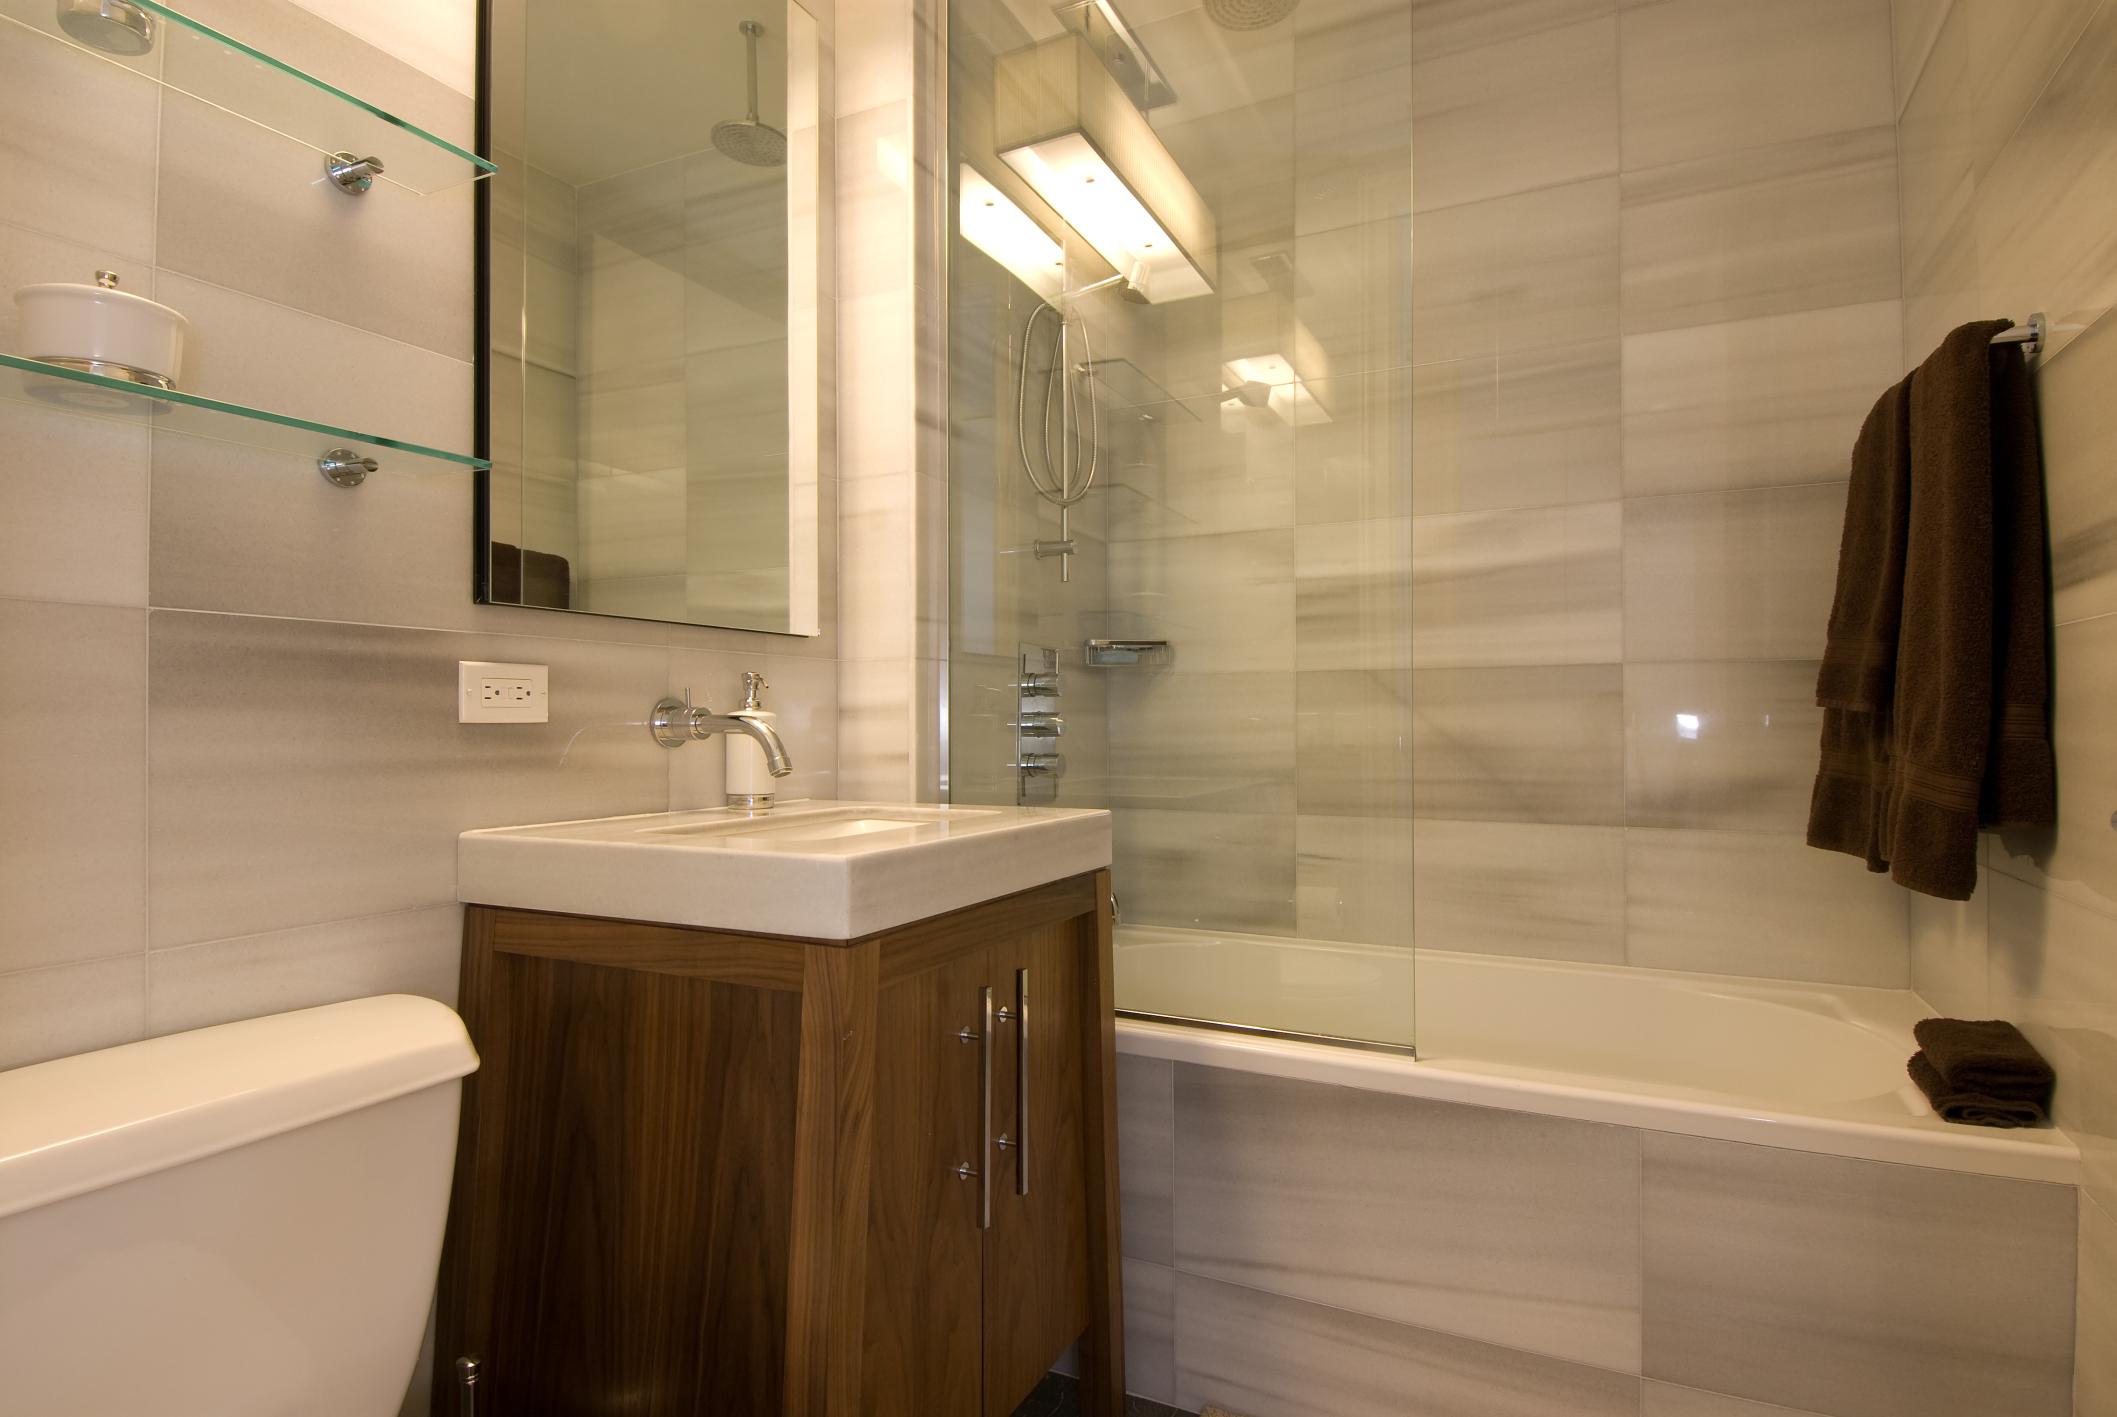 Shower And Tub Ideas For A Small Bathroom Homesteady